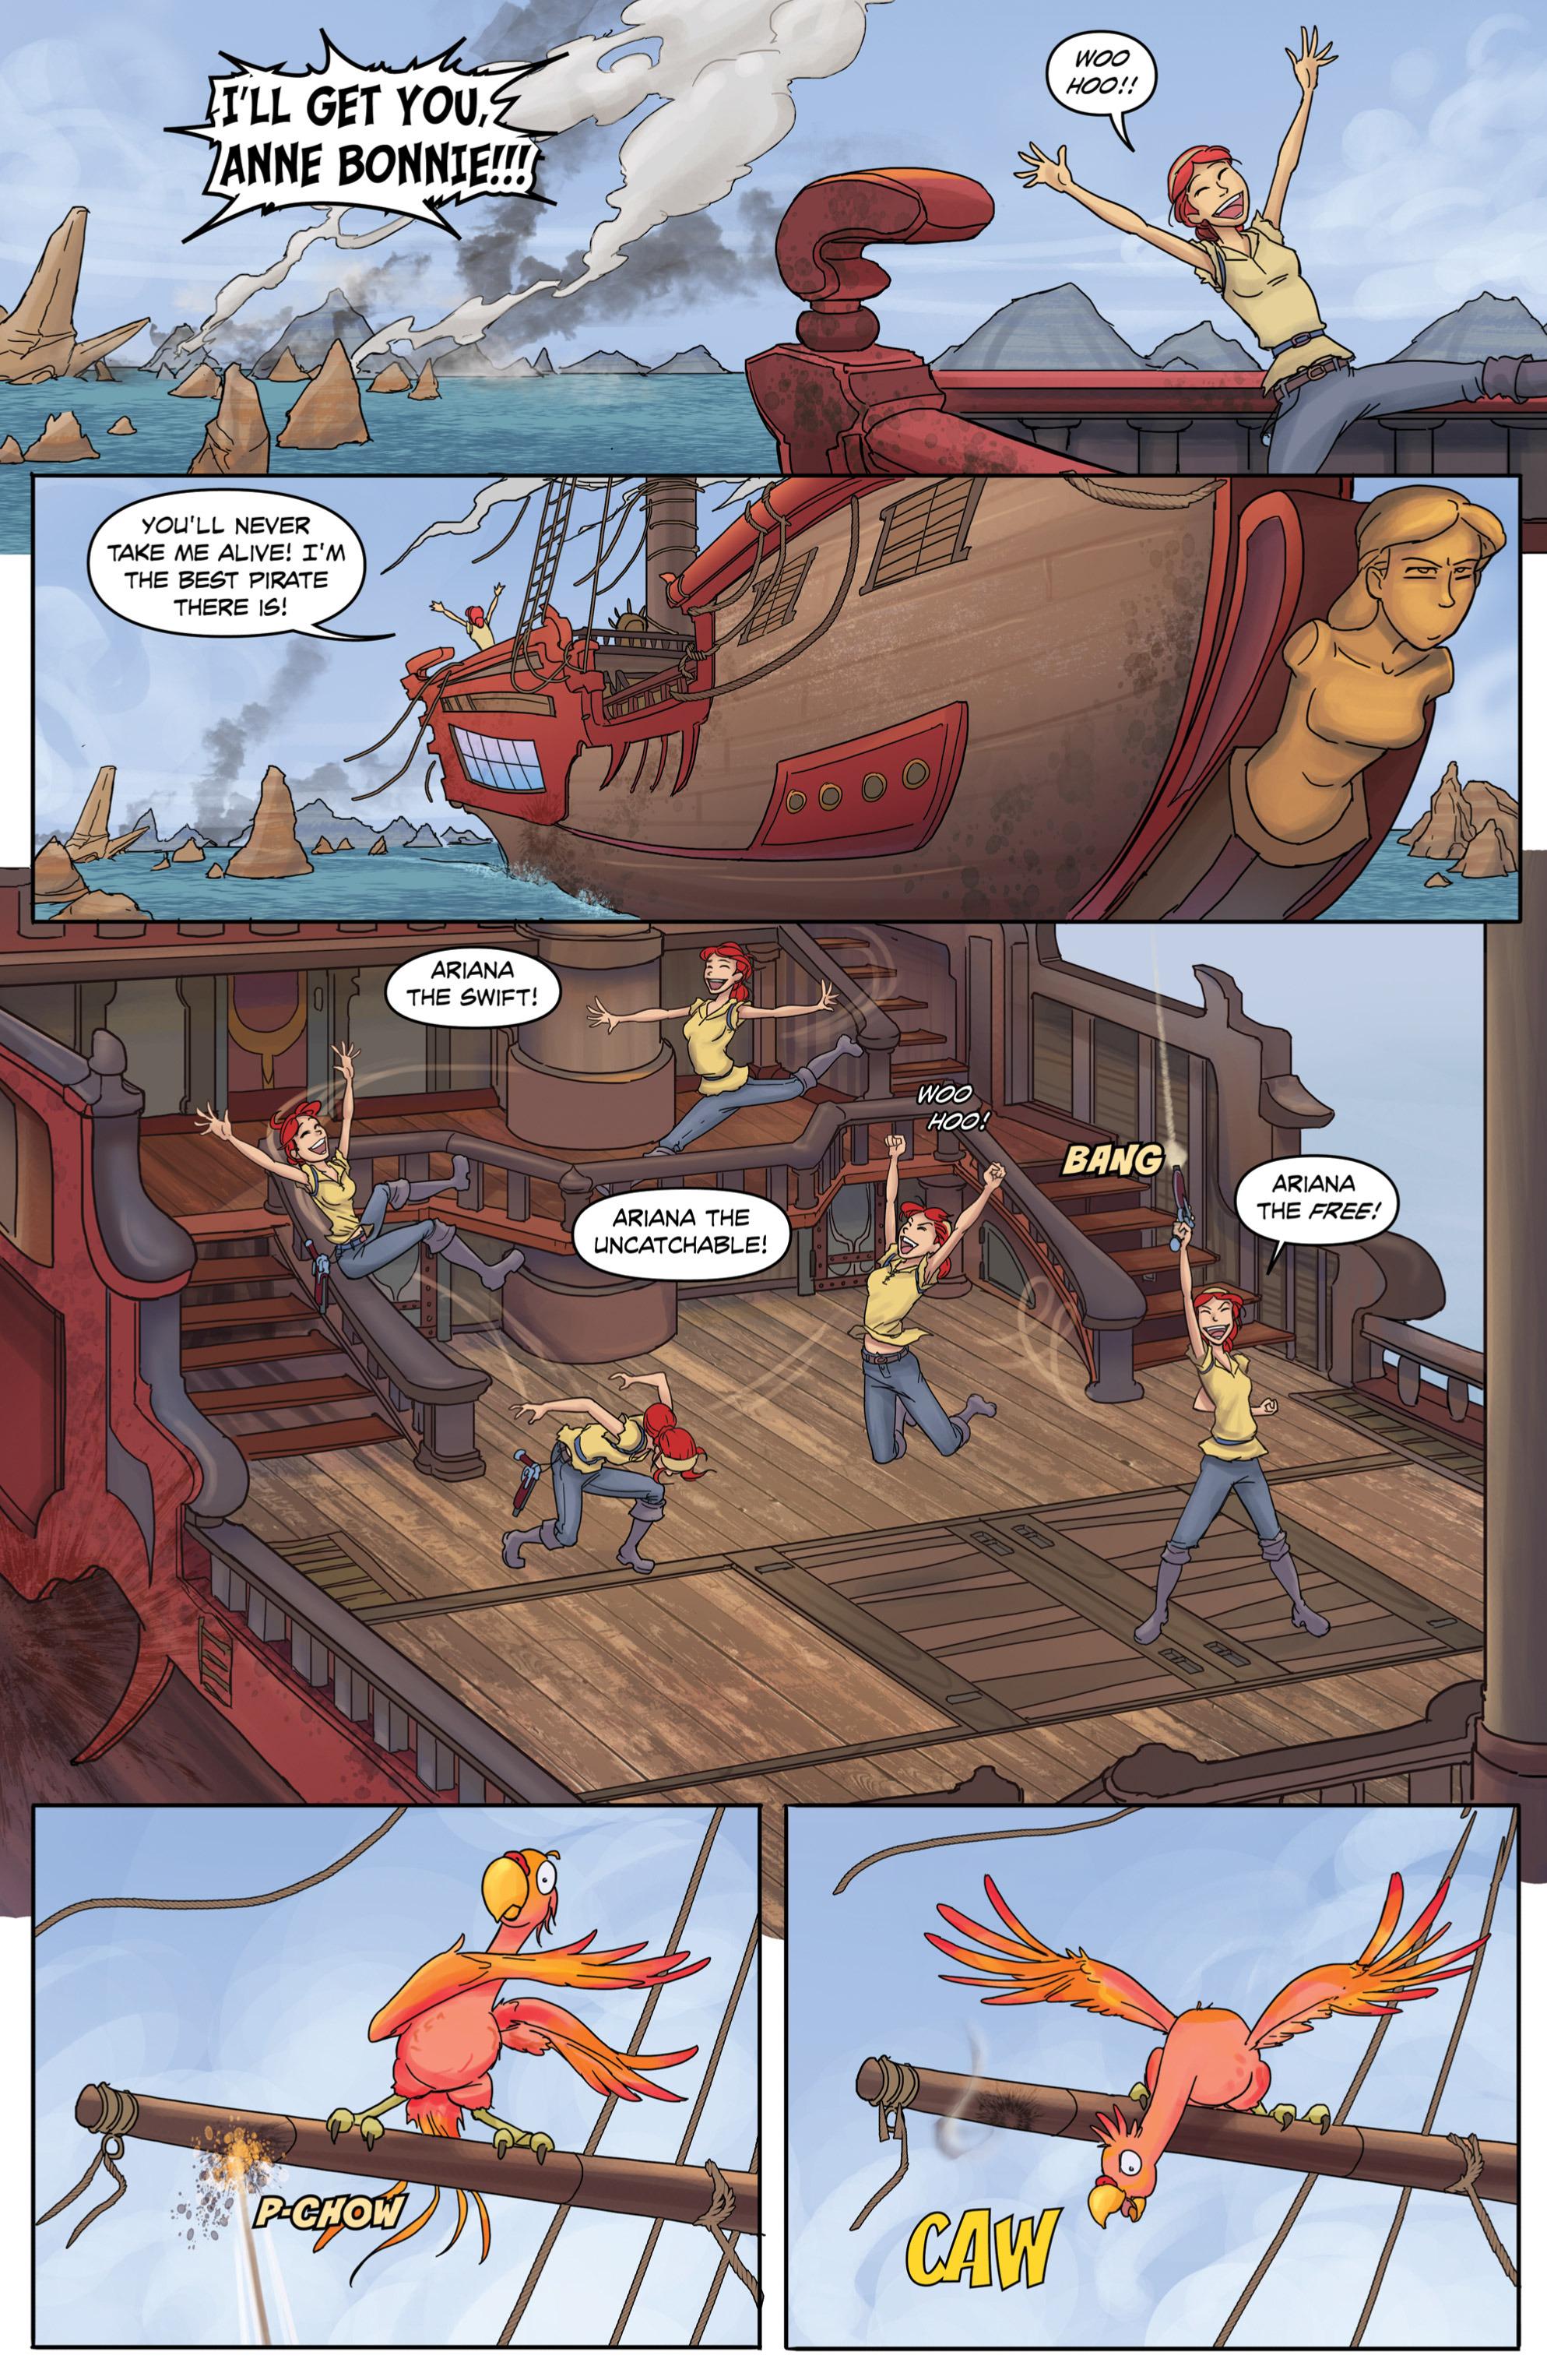 Read online Anne Bonnie comic -  Issue #2 - 10